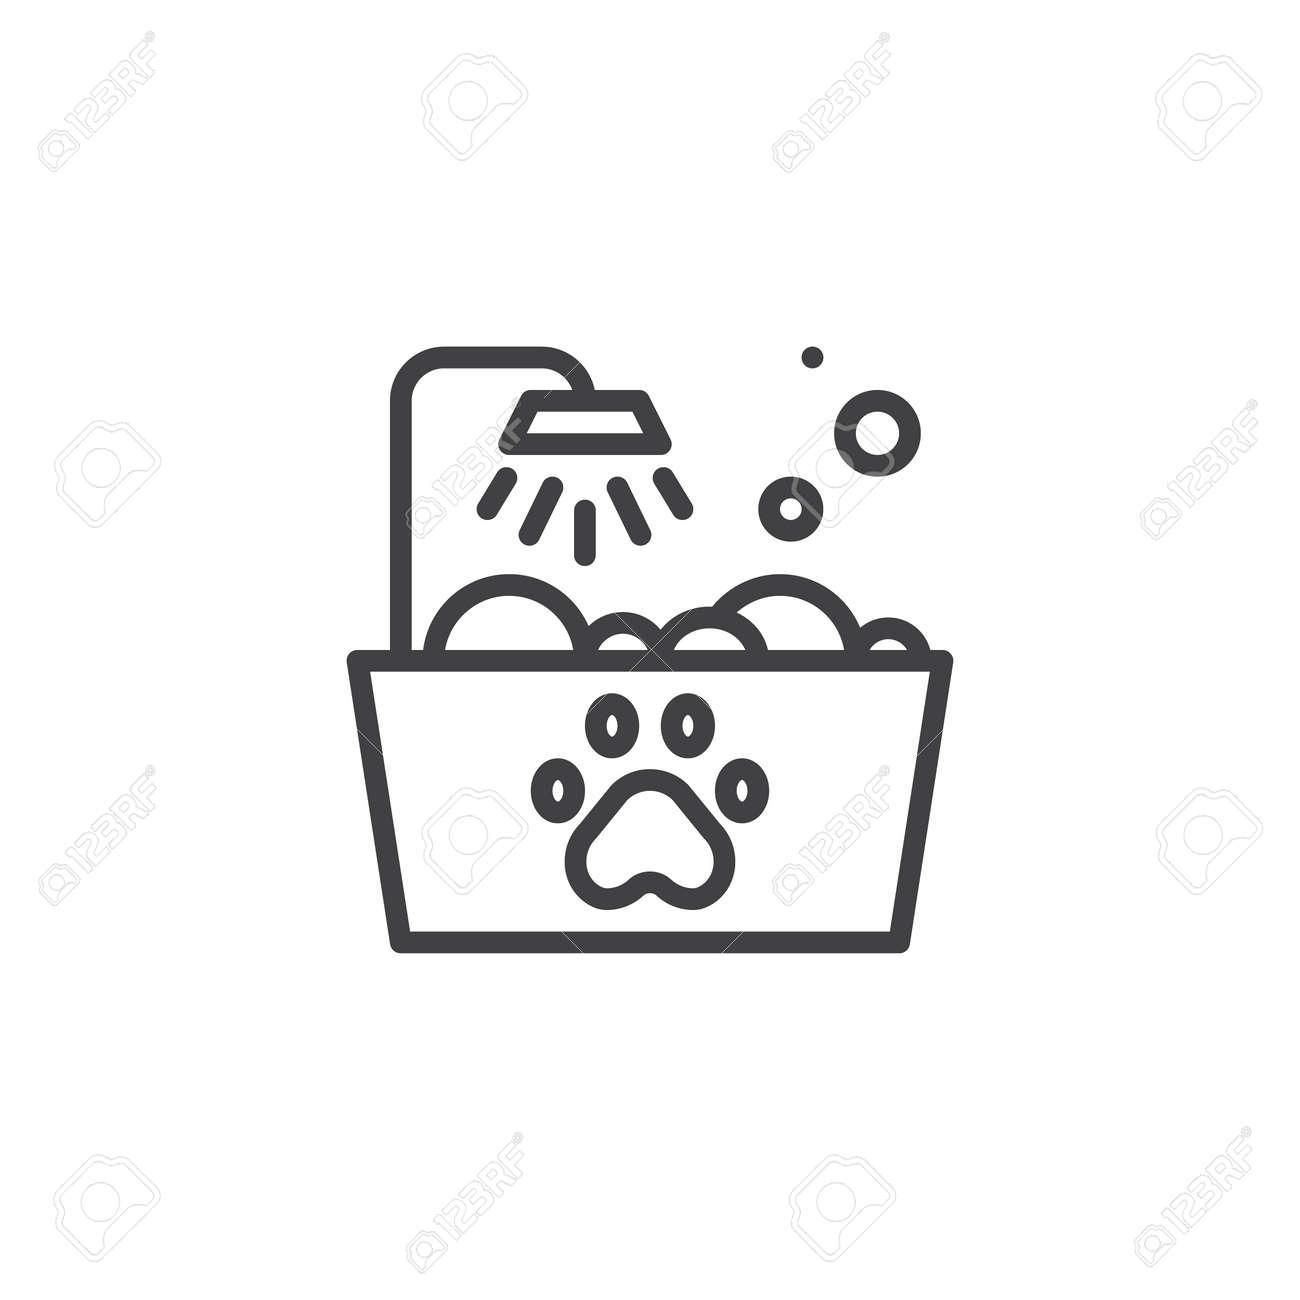 Pictograma Baño | Icono De Linea De Bano De Mascotas Signo De Vector De Contorno